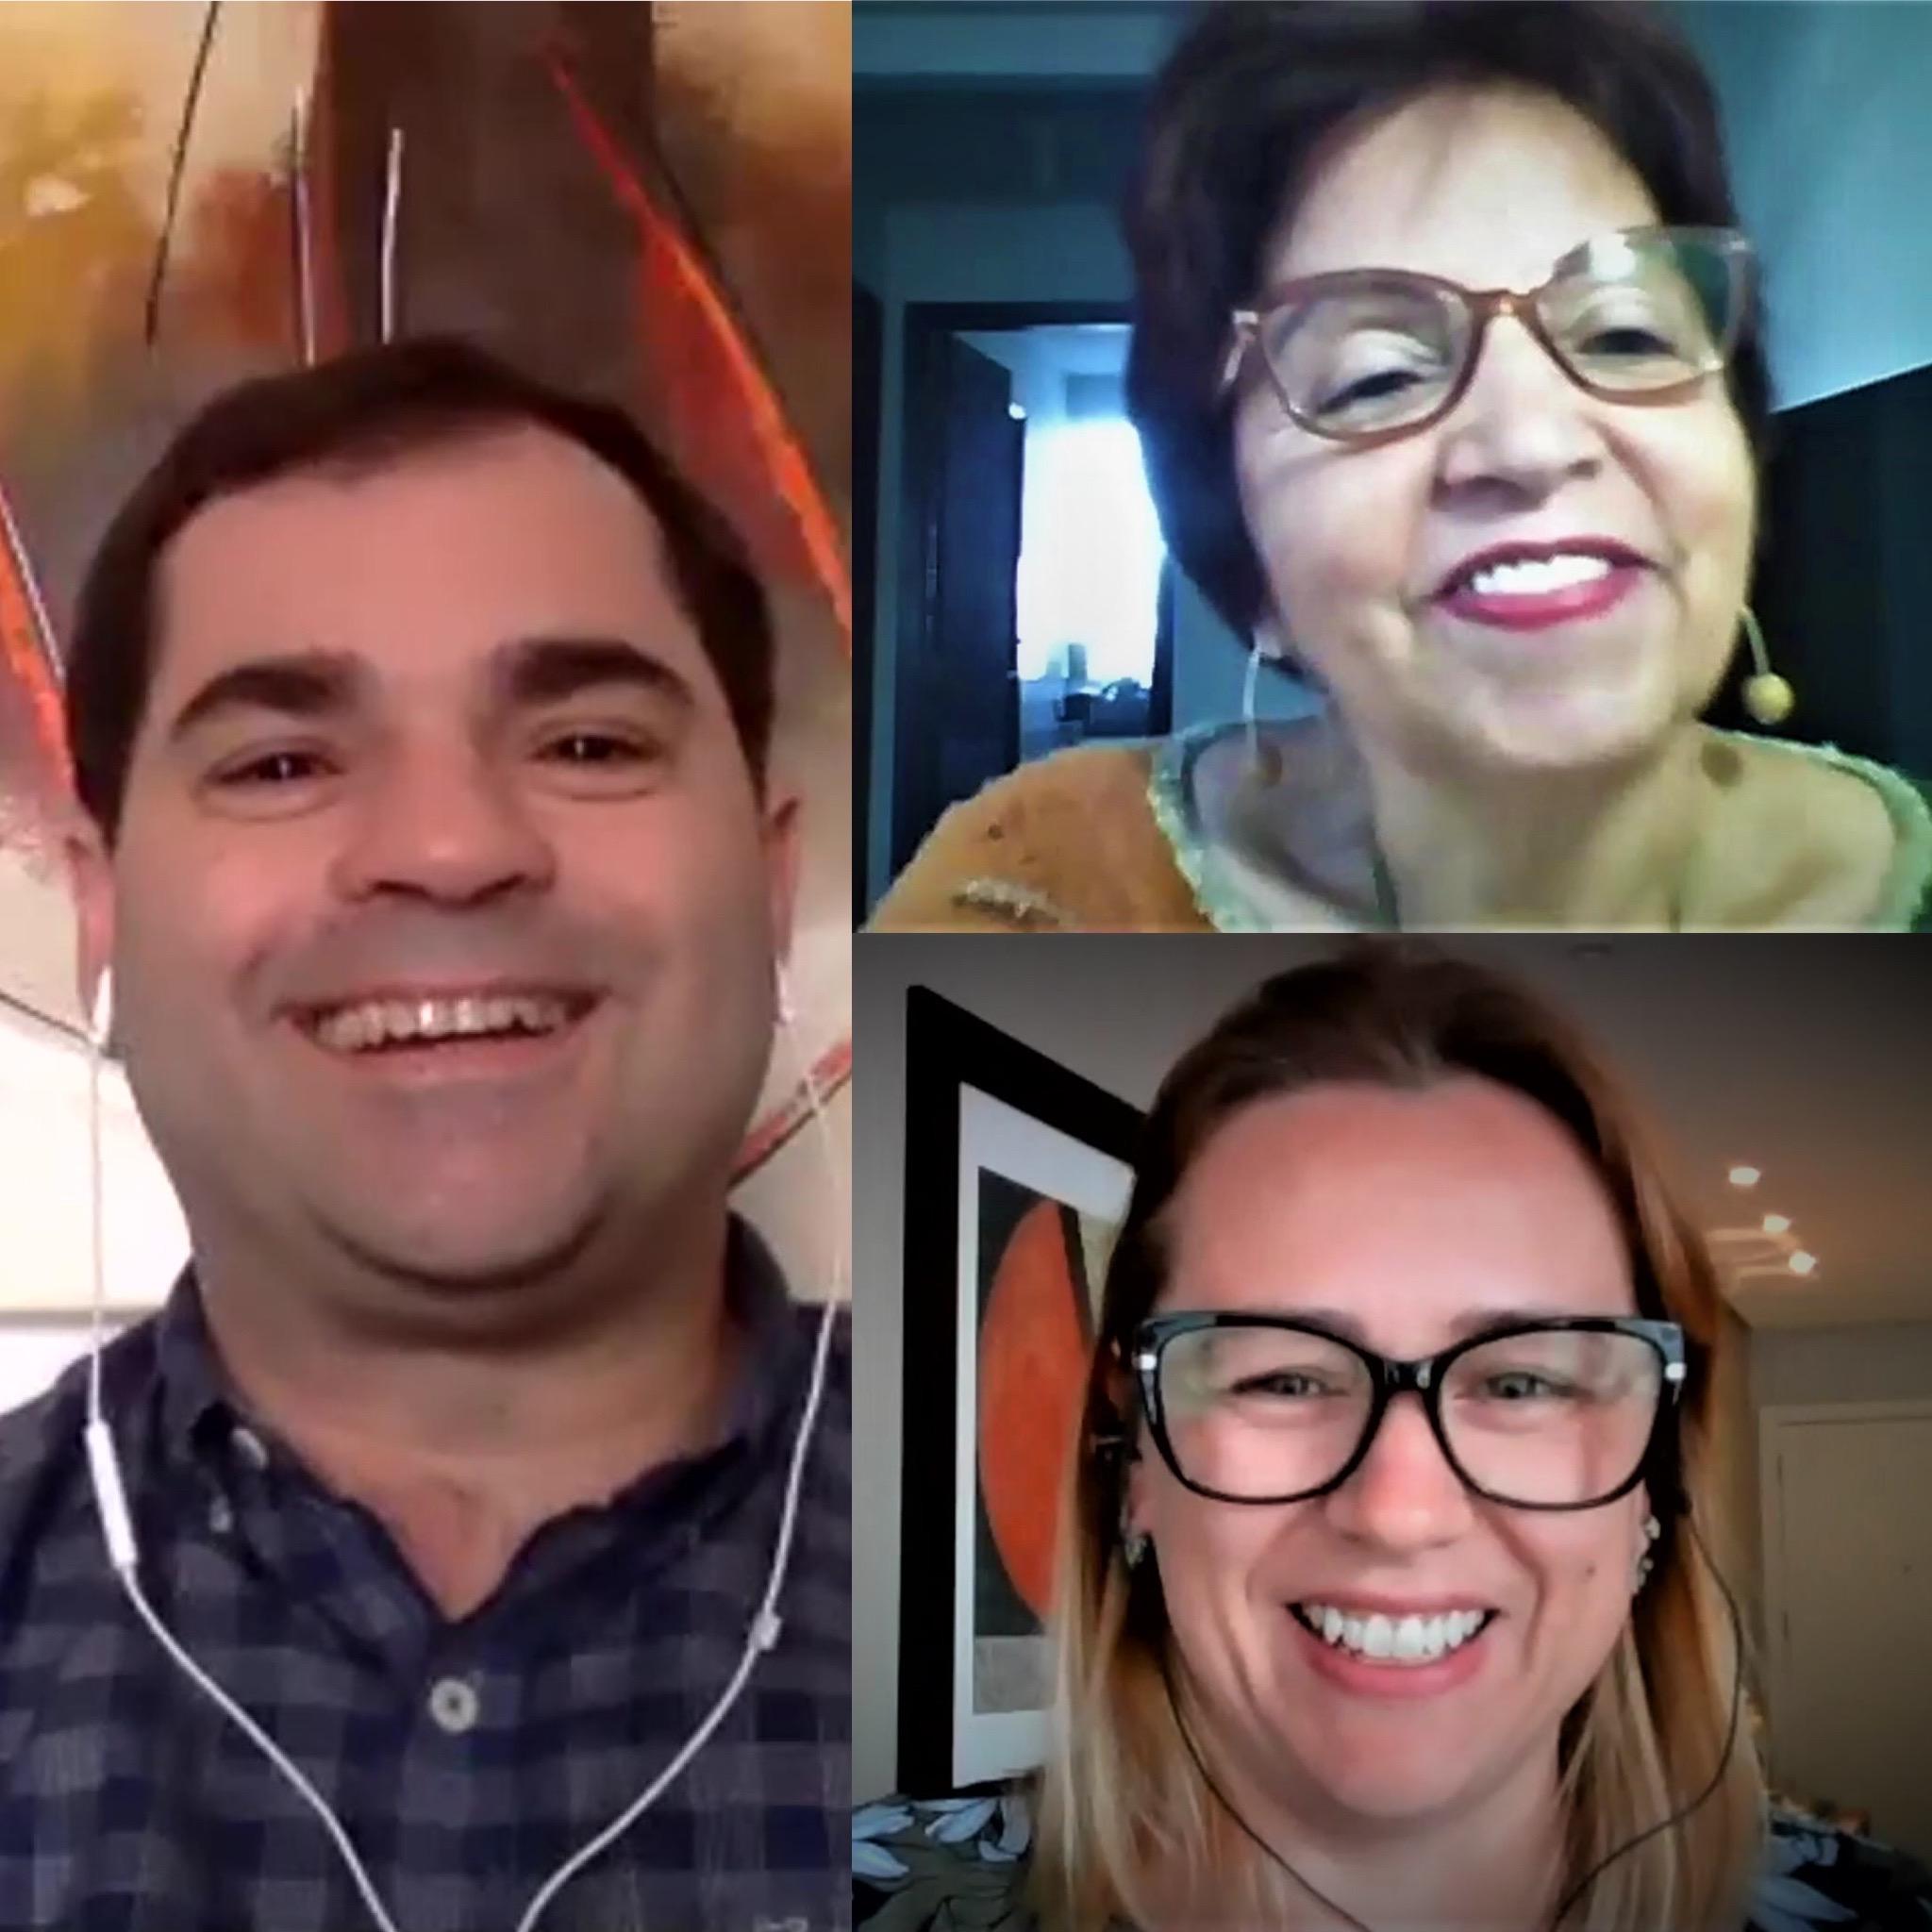 André Machado-Cleuza de Jesus Zanatta-Lisiane Vieira de Abreu-Entrepreneurial Mindset Profile (EMP) Practitioners